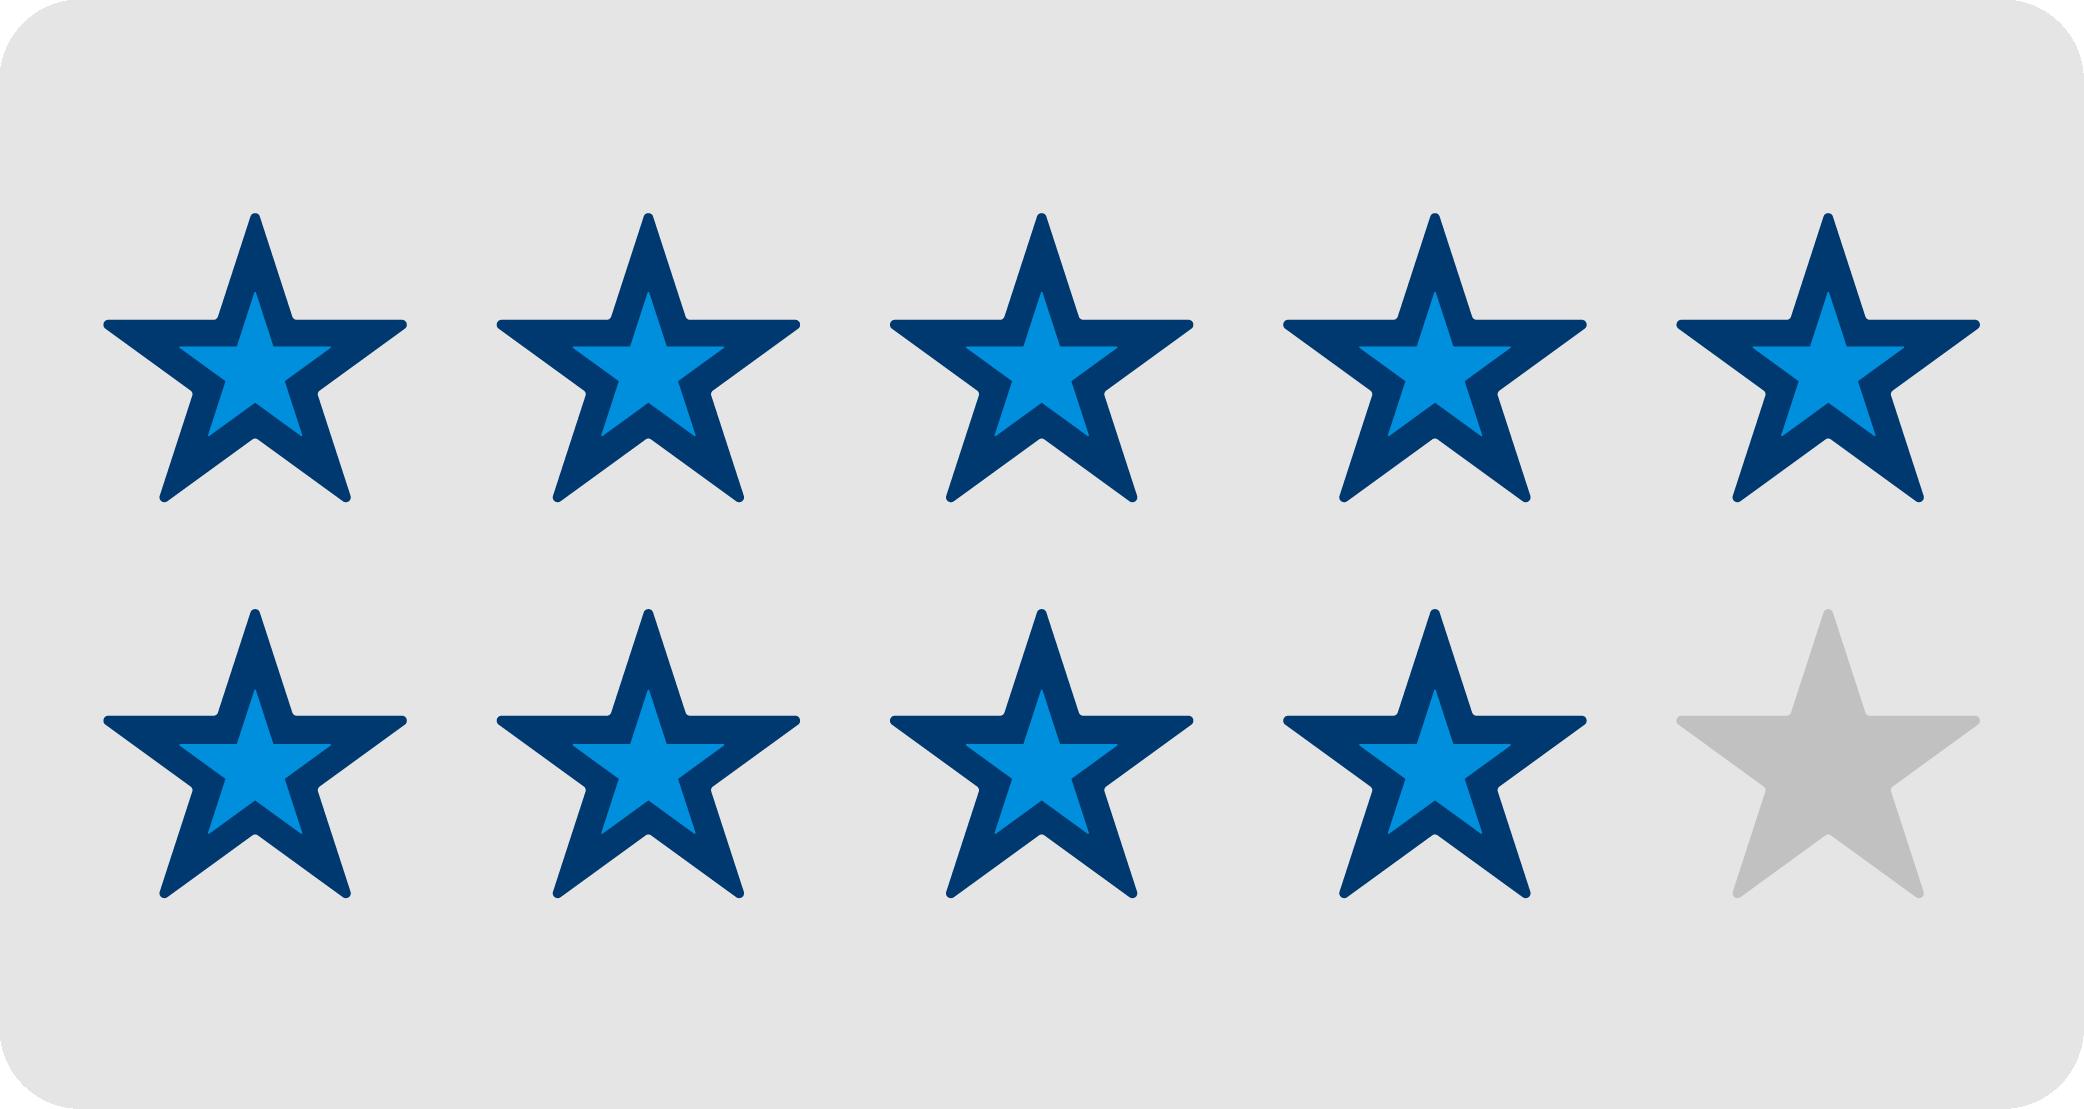 9/10 stars filled in